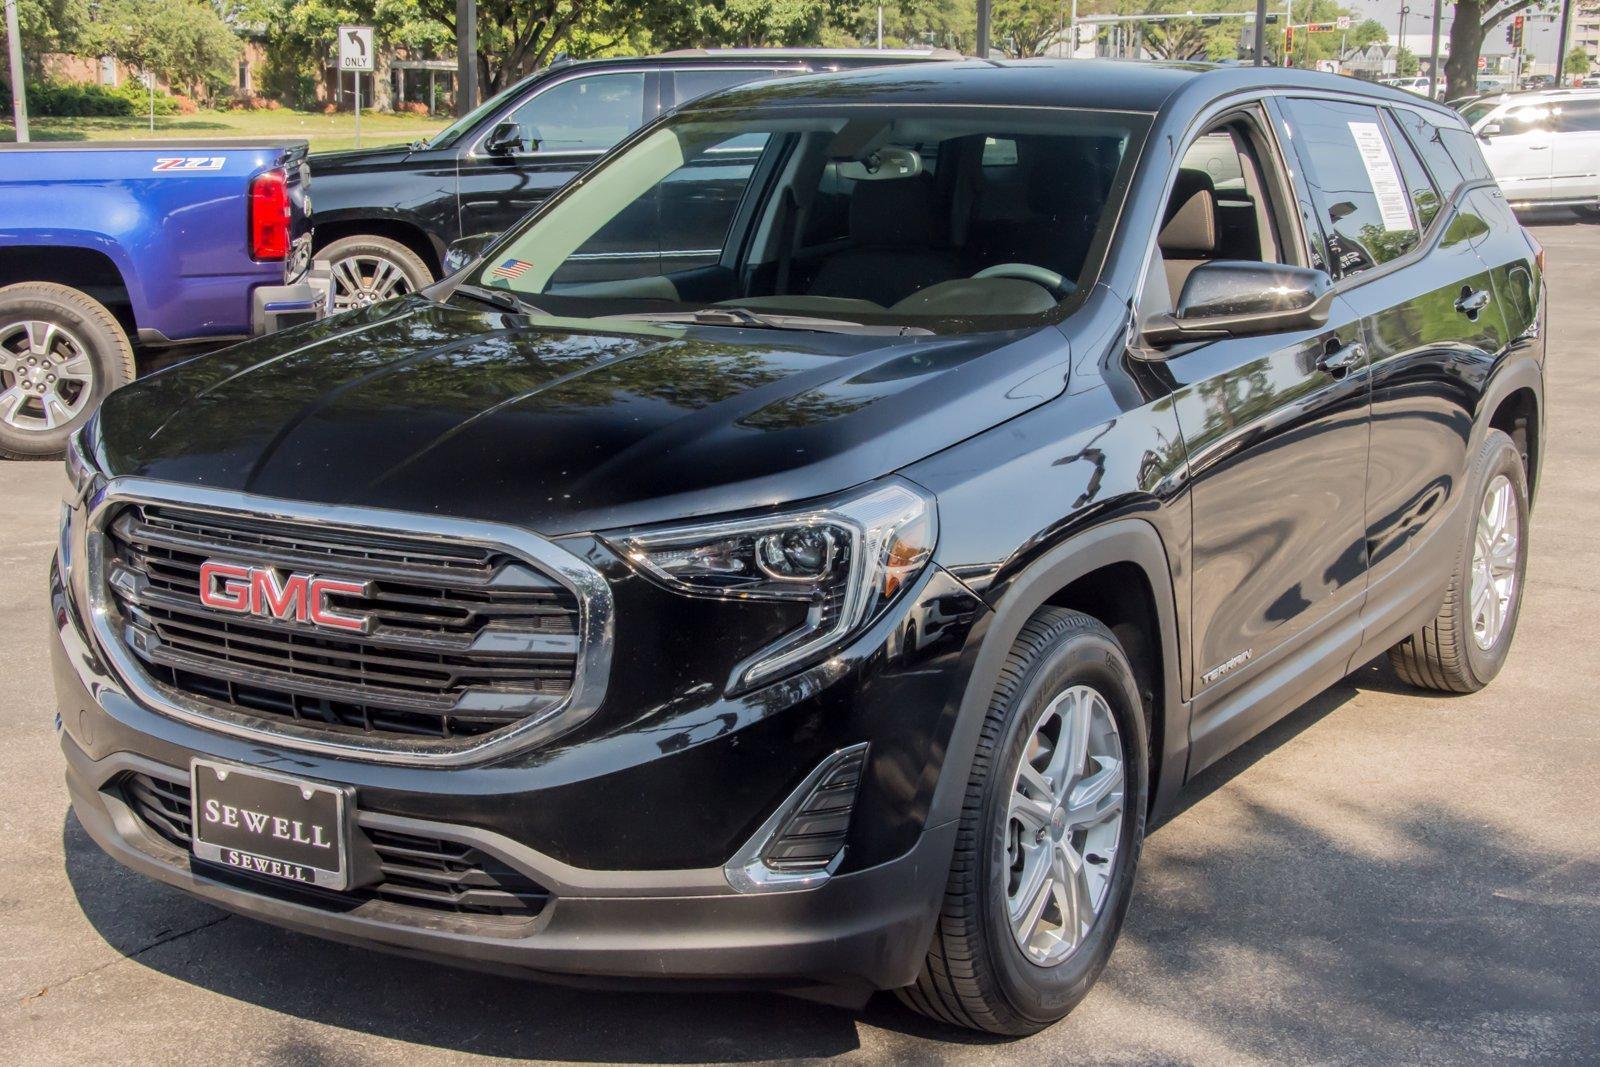 2018 GMC Terrain Vehicle Photo in Dallas, TX 75209